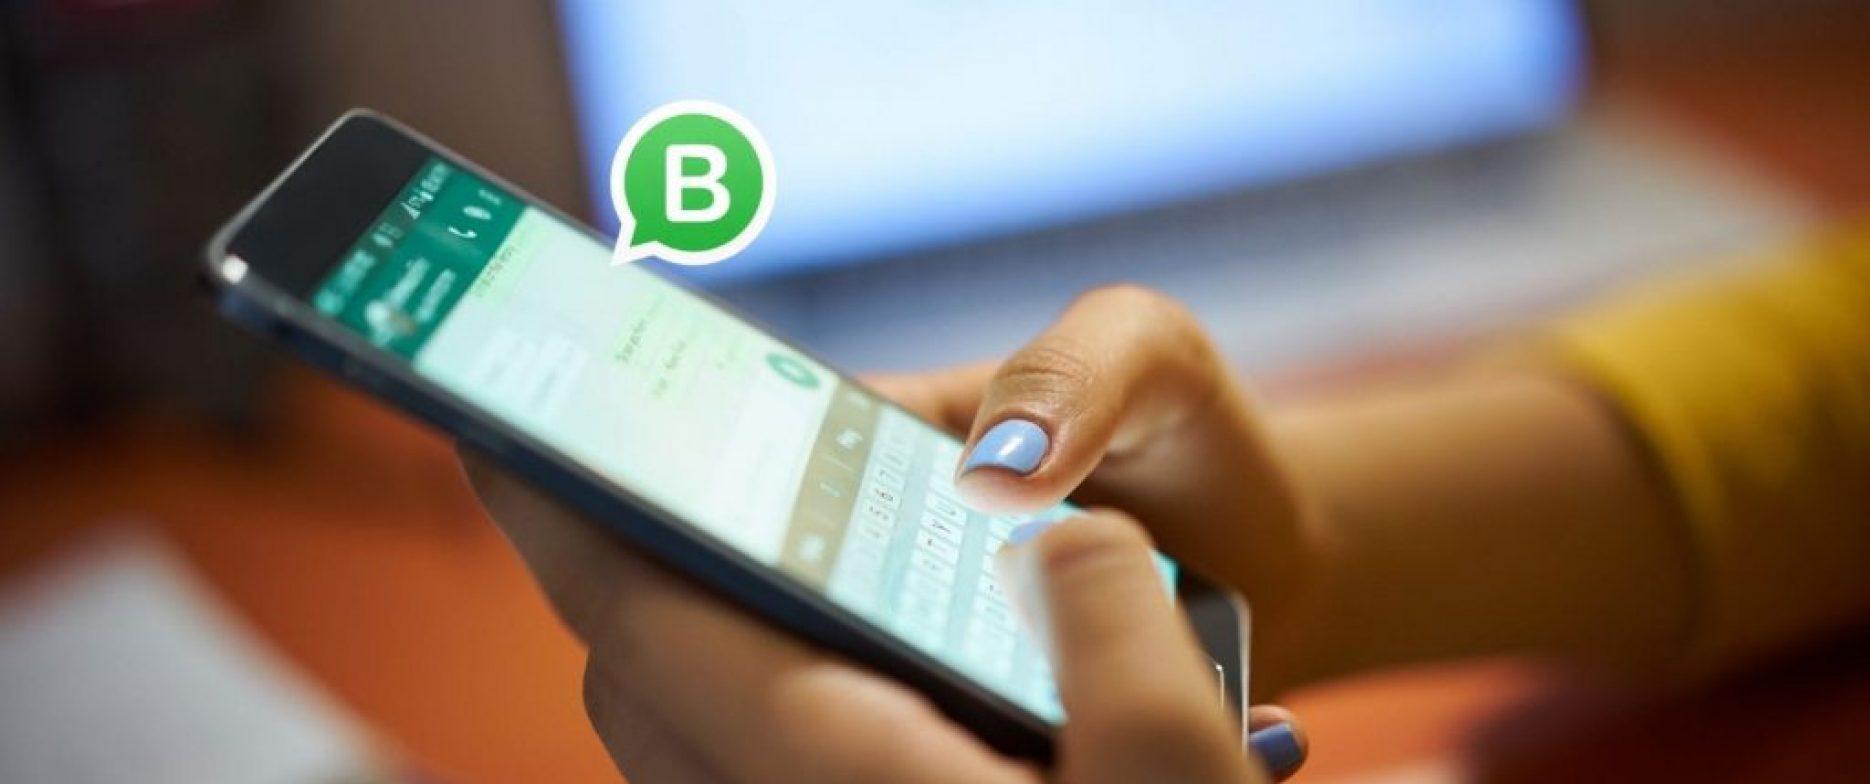 Vende desde Whatsapp: Los catálogos de WhatsApp Business